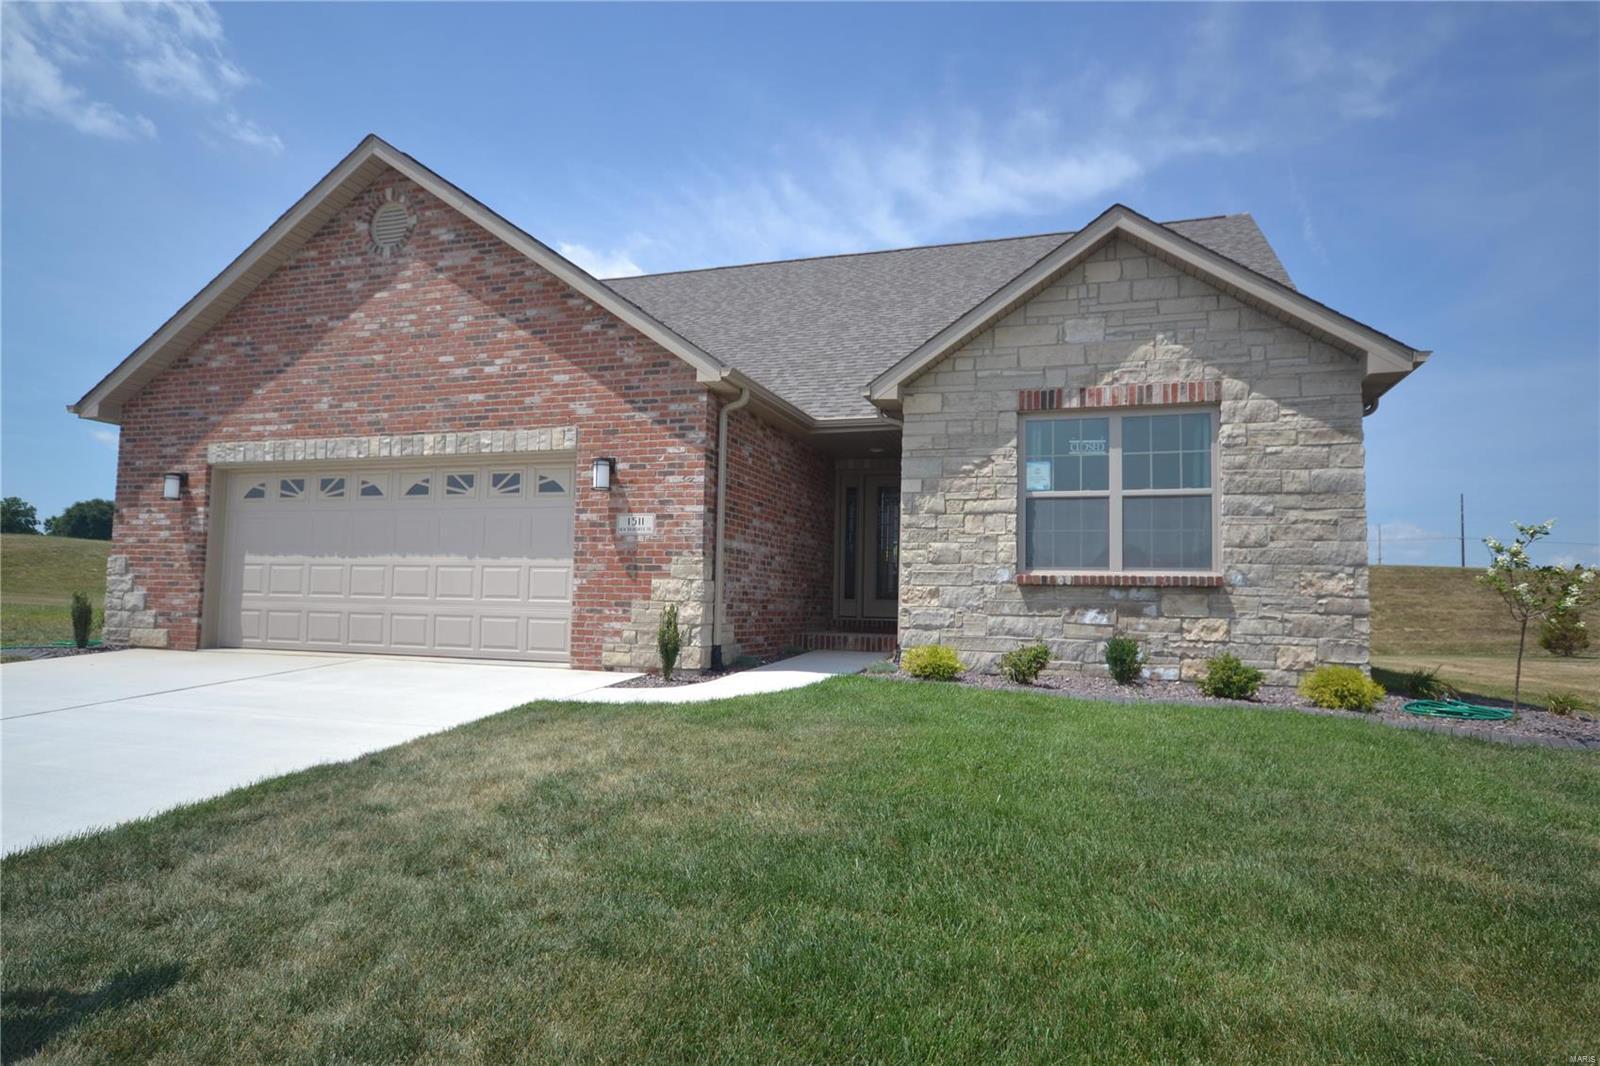 4417 TBB Devin Drive Property Photo - Smithton, IL real estate listing